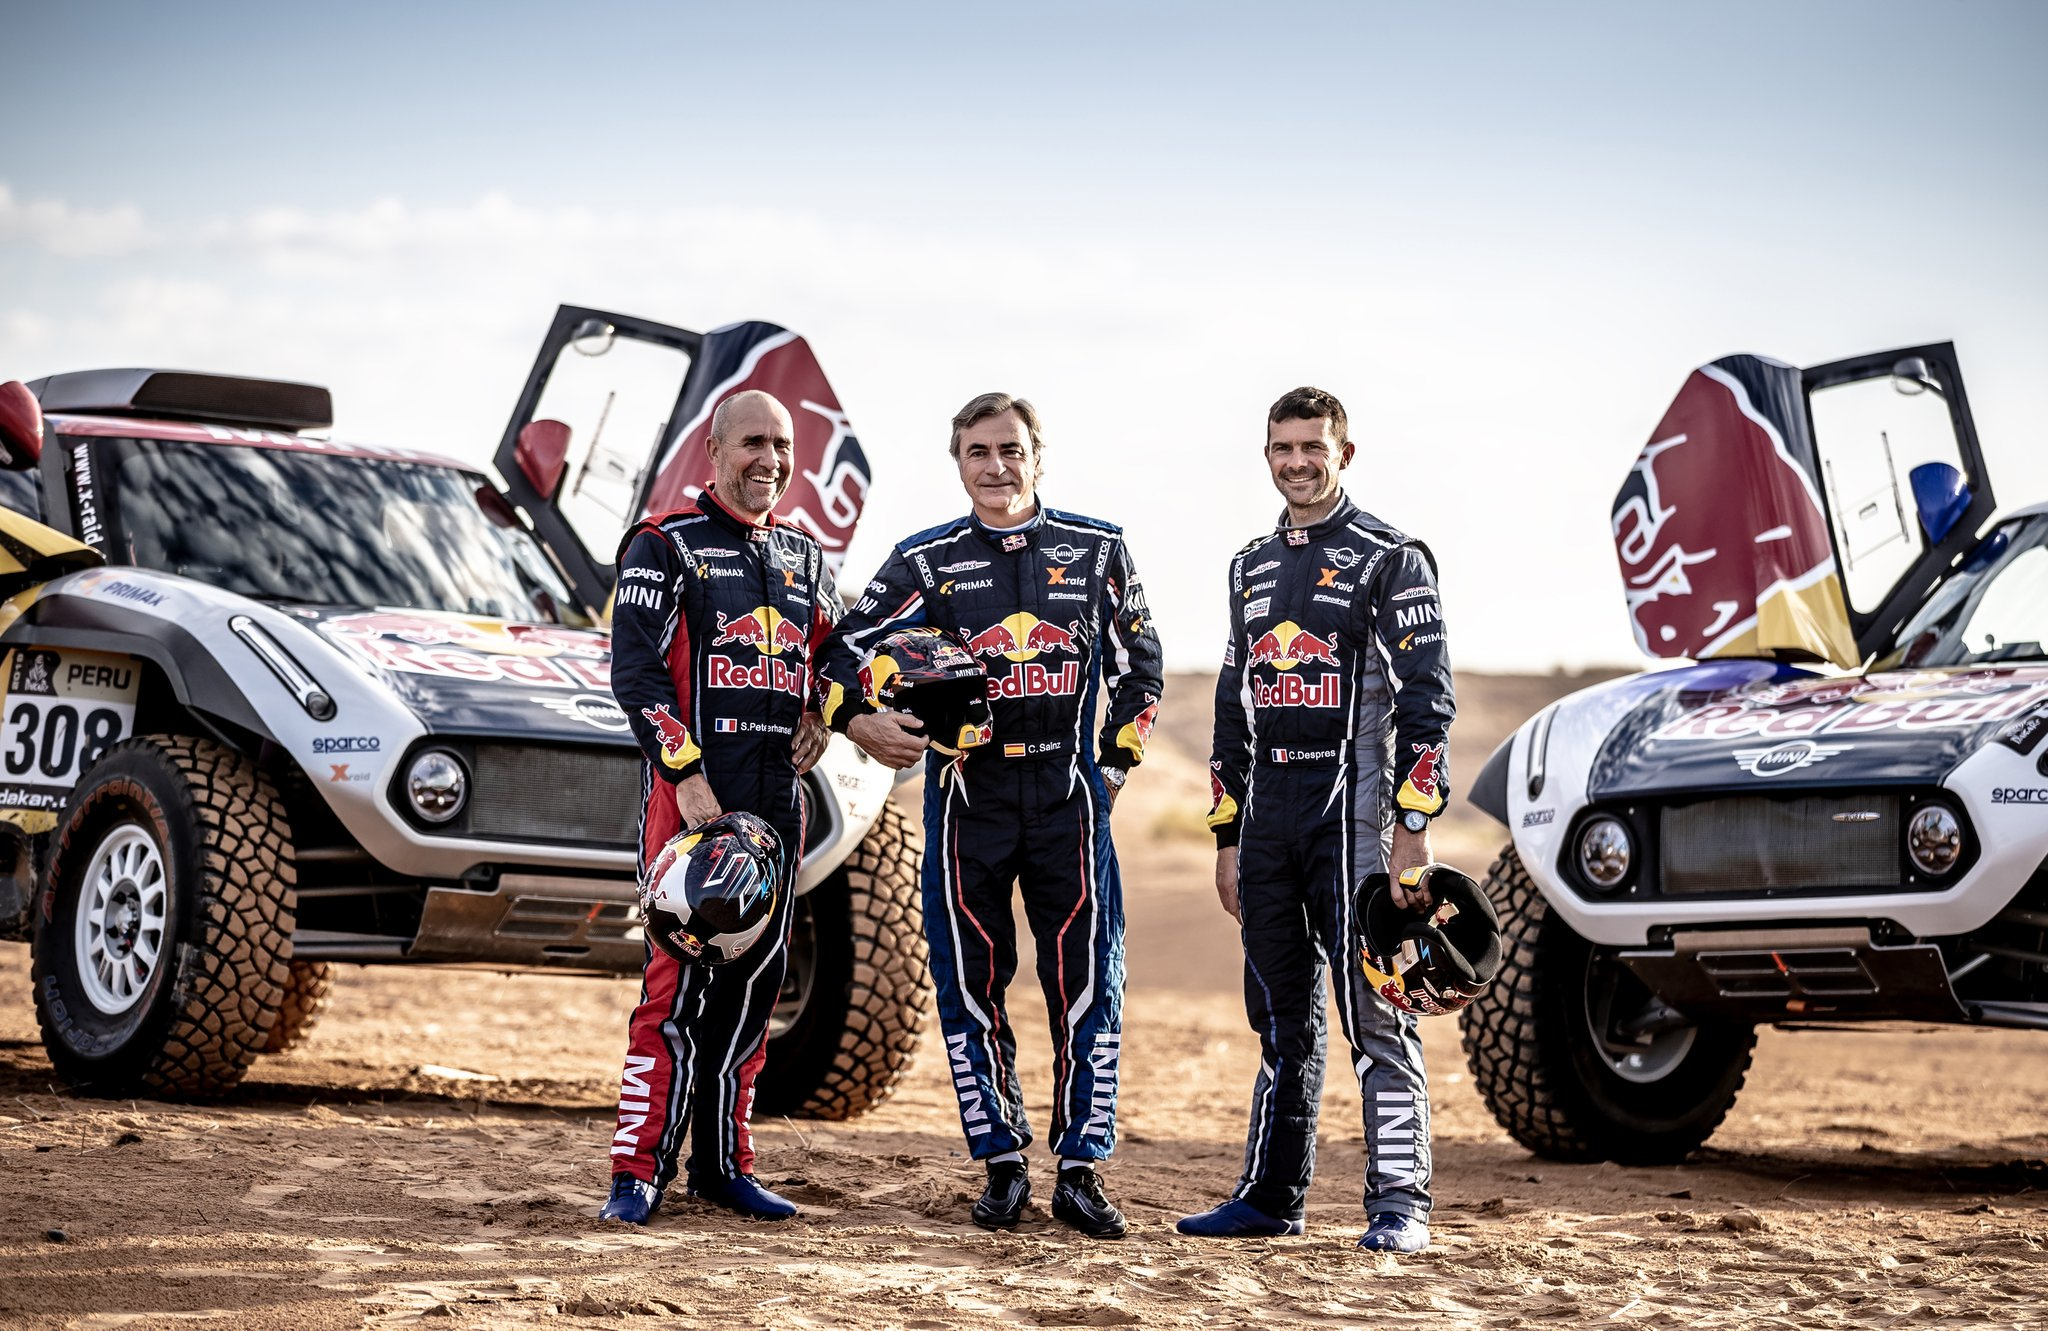 2017 Rallye Raid Dakar Paraguay - Bolivia - Argentina [2-14 Enero] - Página 37 DofPNtXWkAAYqTk